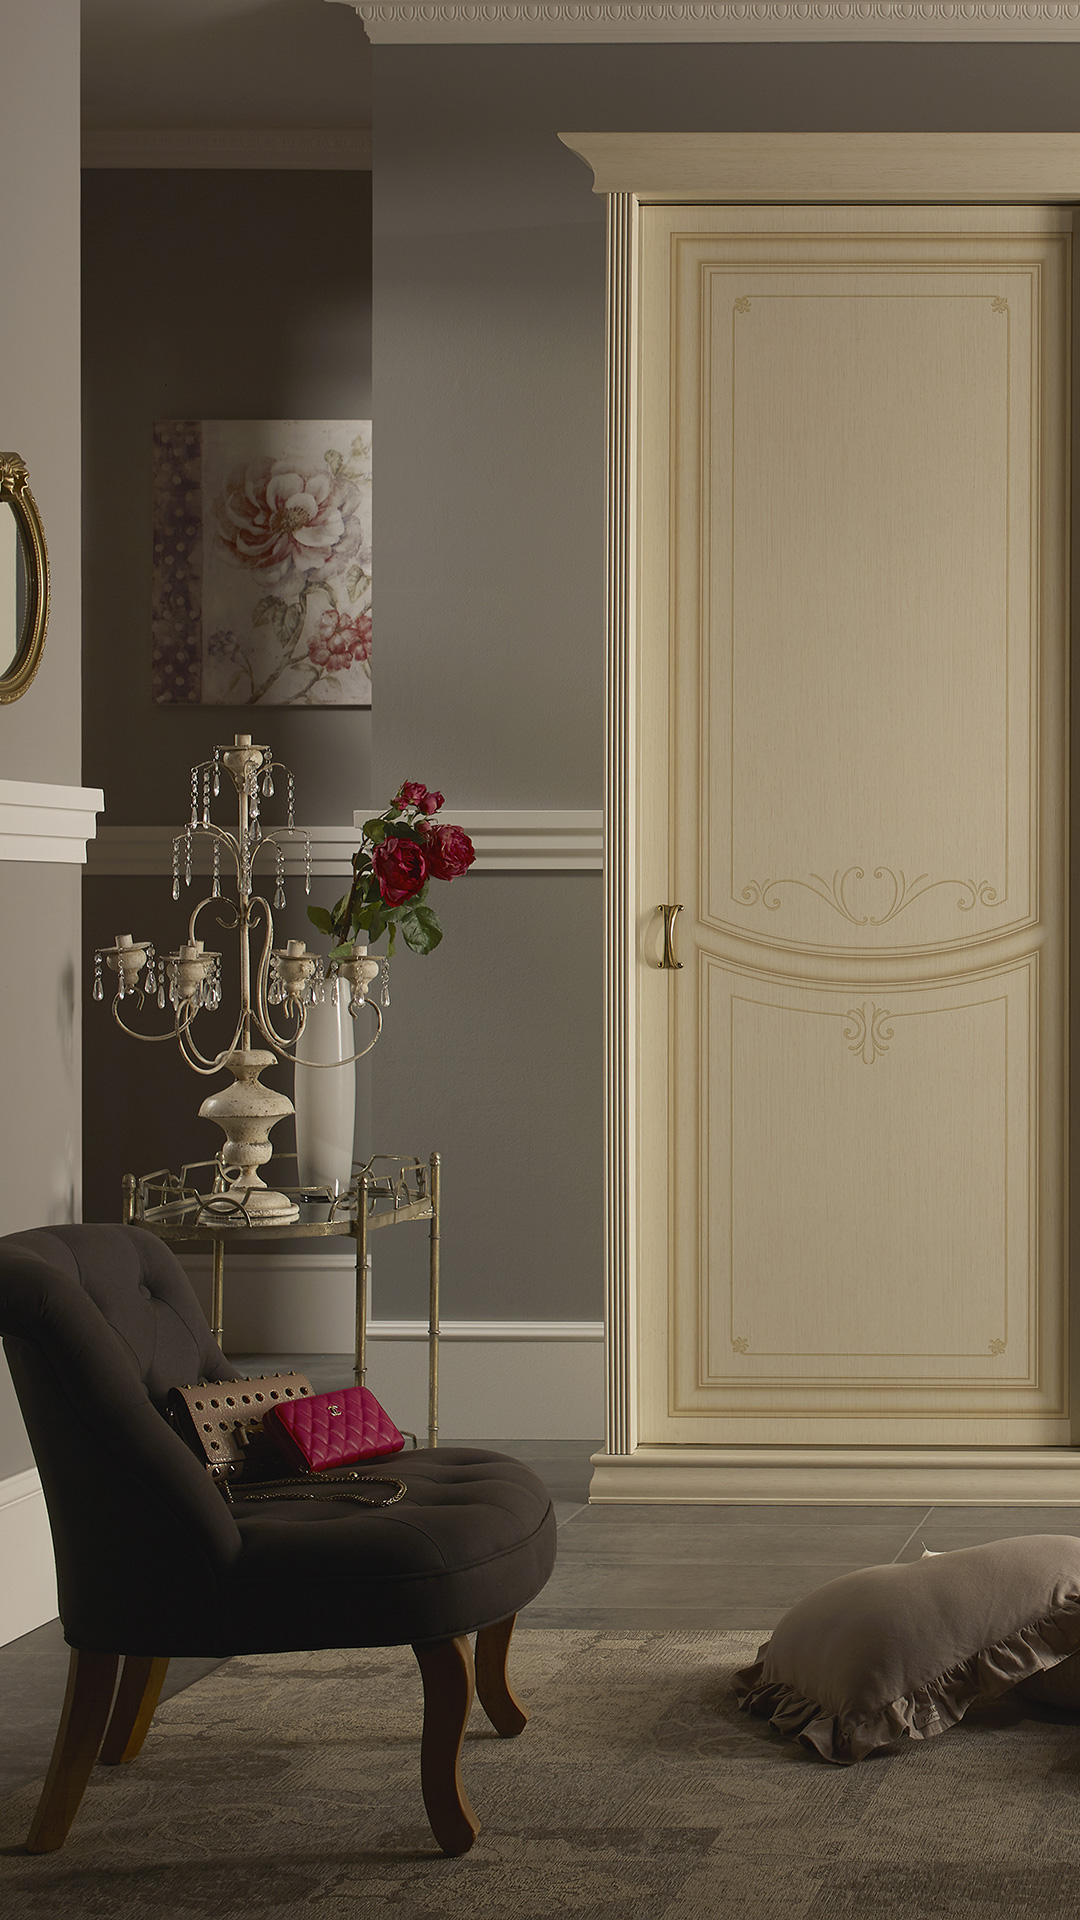 primula 3 trg kleiderschrank yuvam m belhaus in wuppertal cilek offizieller h ndler in europa. Black Bedroom Furniture Sets. Home Design Ideas